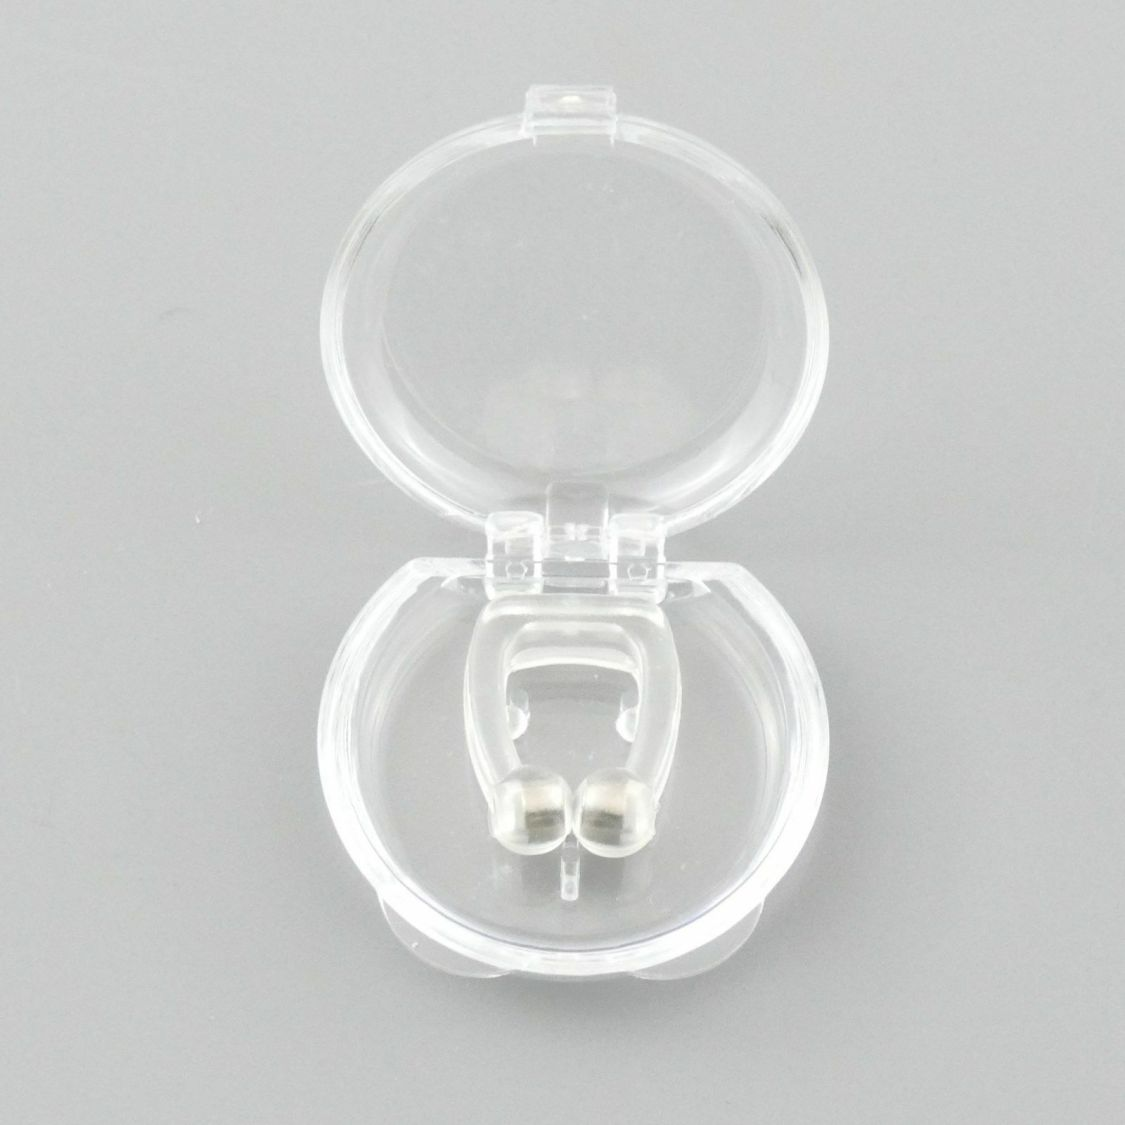 Nase Schnarchstopper Anti Schnarchen Magnet Clip Stopper Nasenclip Nasenspreizer